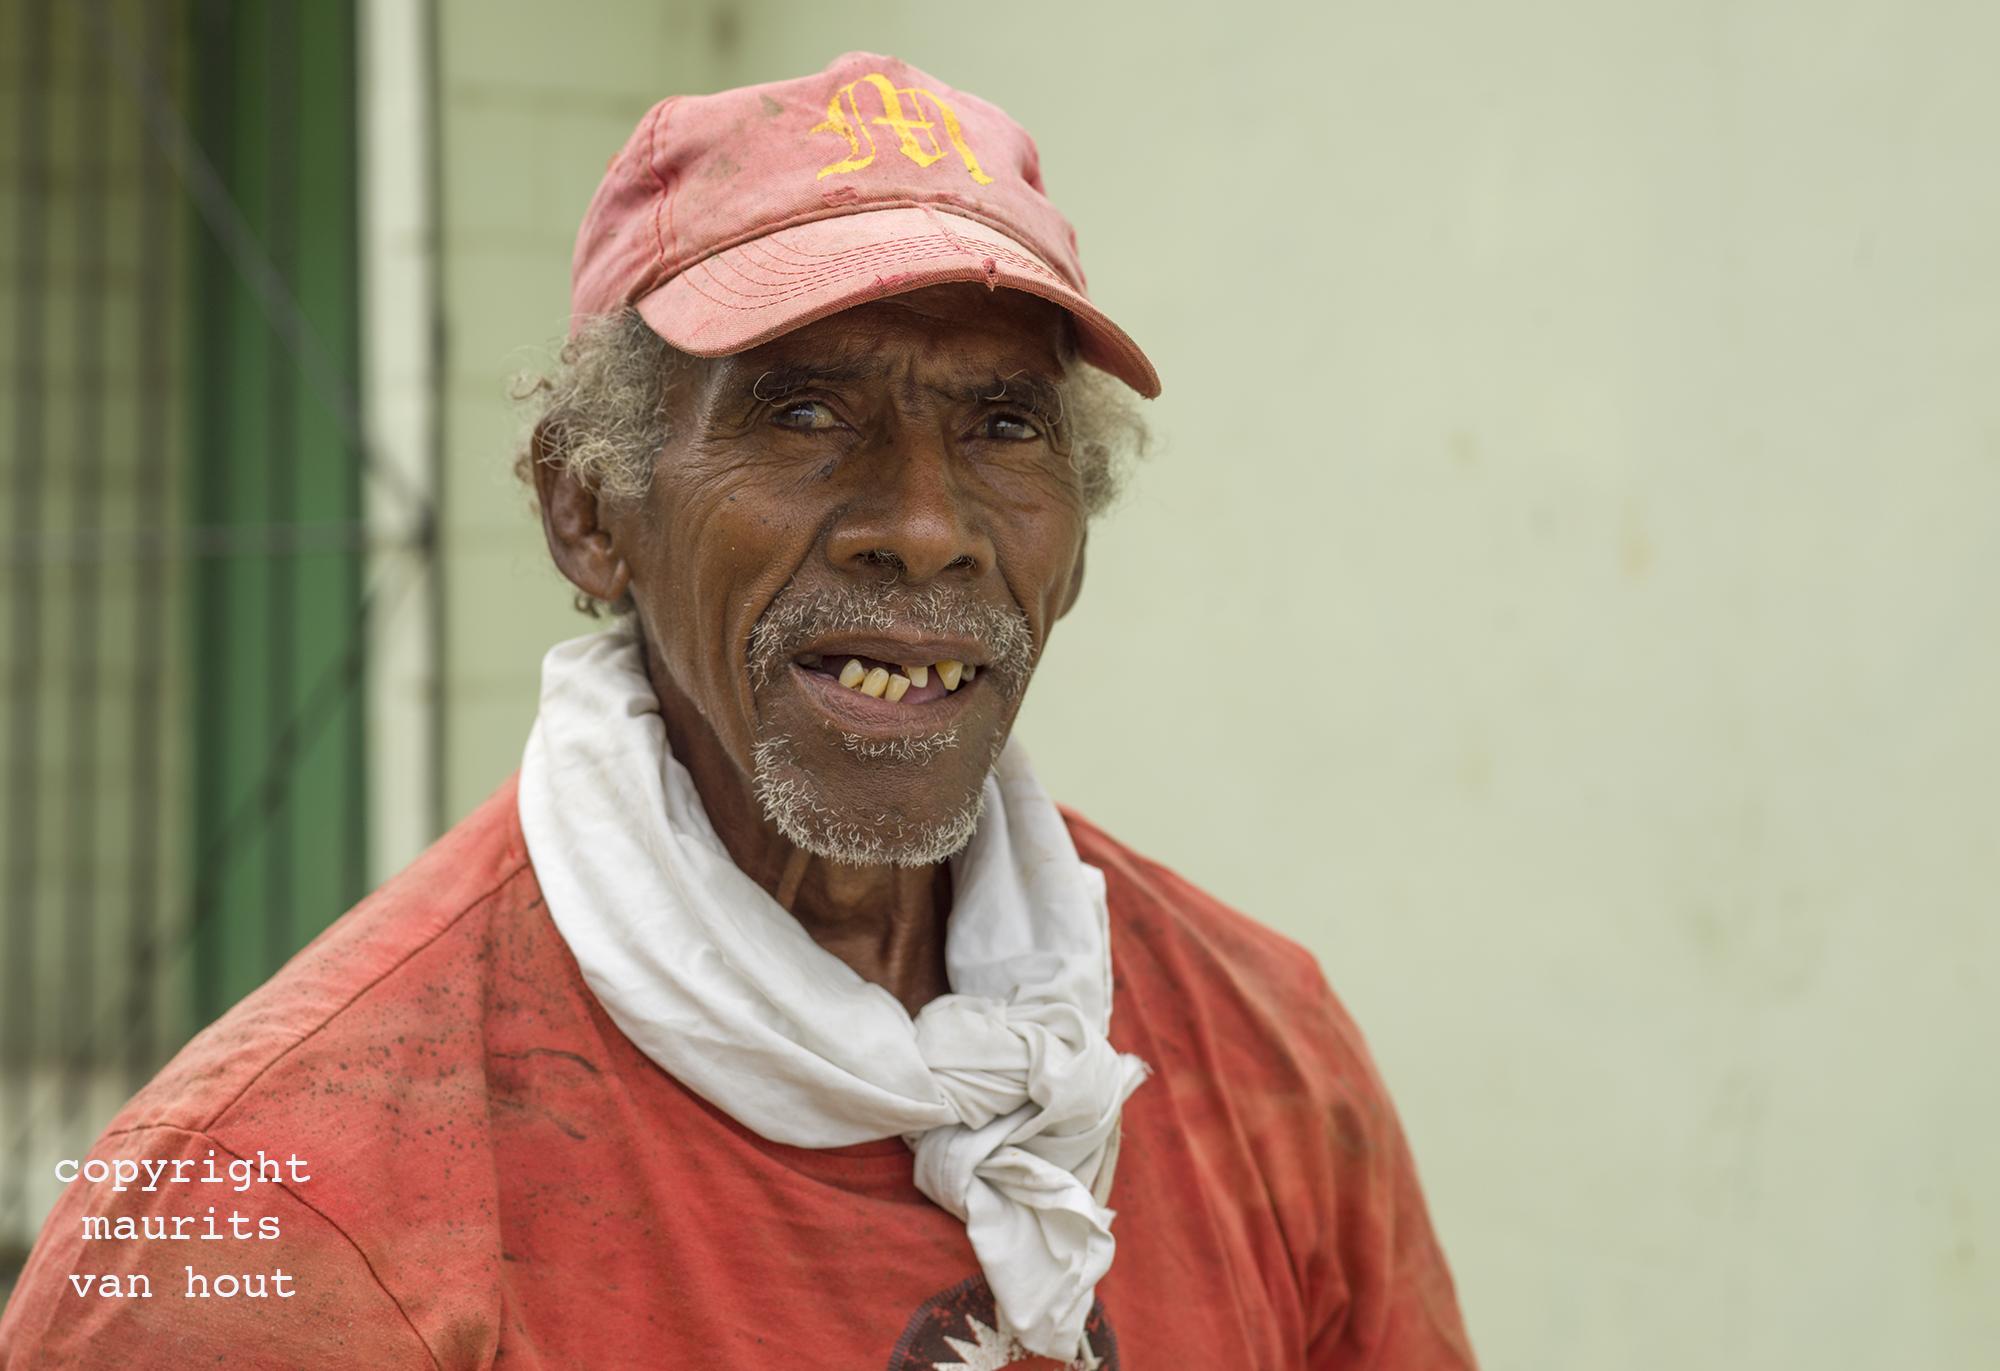 portrait of a man, Varadero Cuba, by Dutch photographer Maurits van Hout